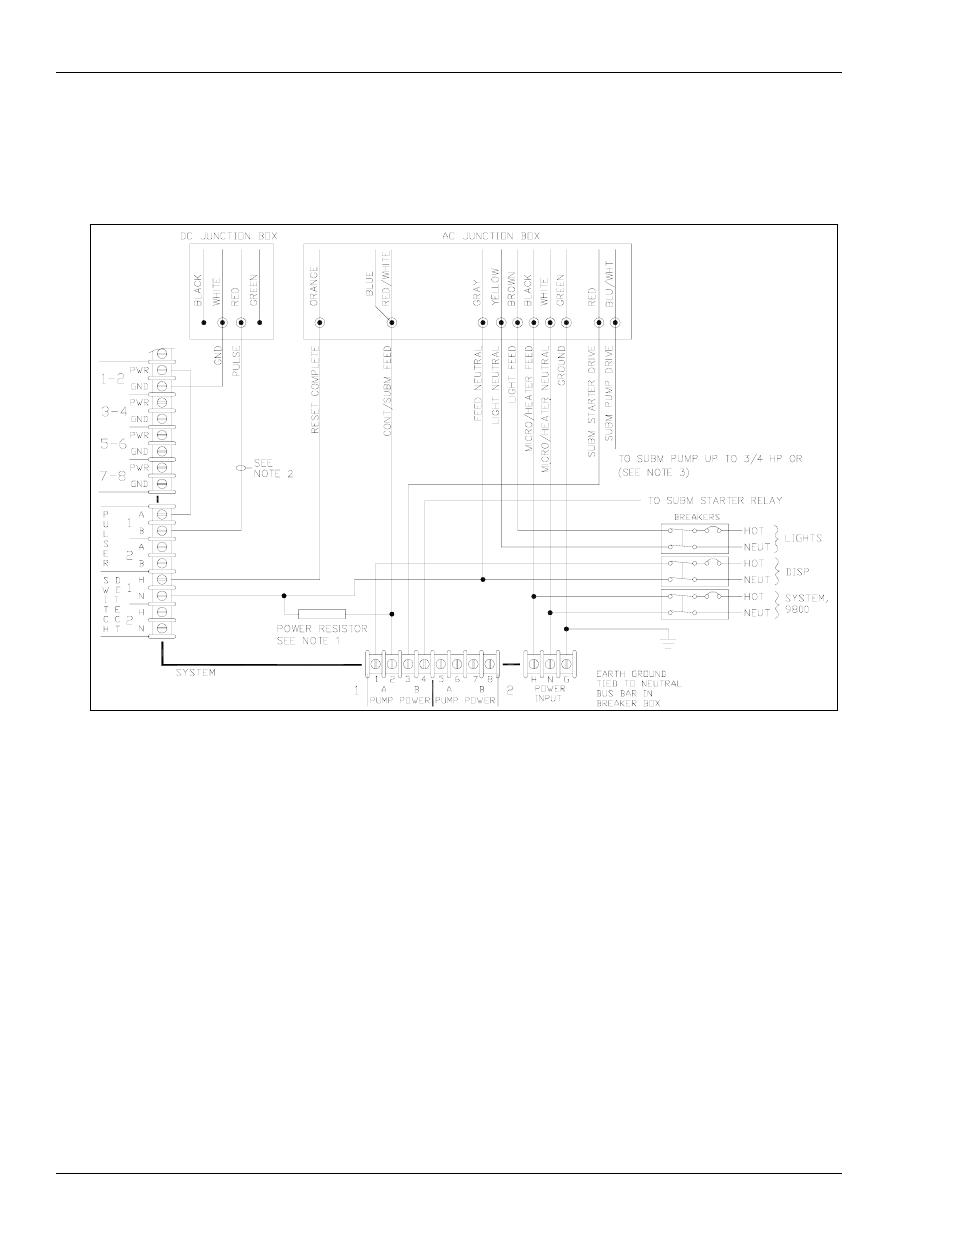 9852qx, 9853qx, 9840qx, 9850ax, 9850axs dispensers   gasboy 1000 series  fuel management system installation user manual   page 48 / 68